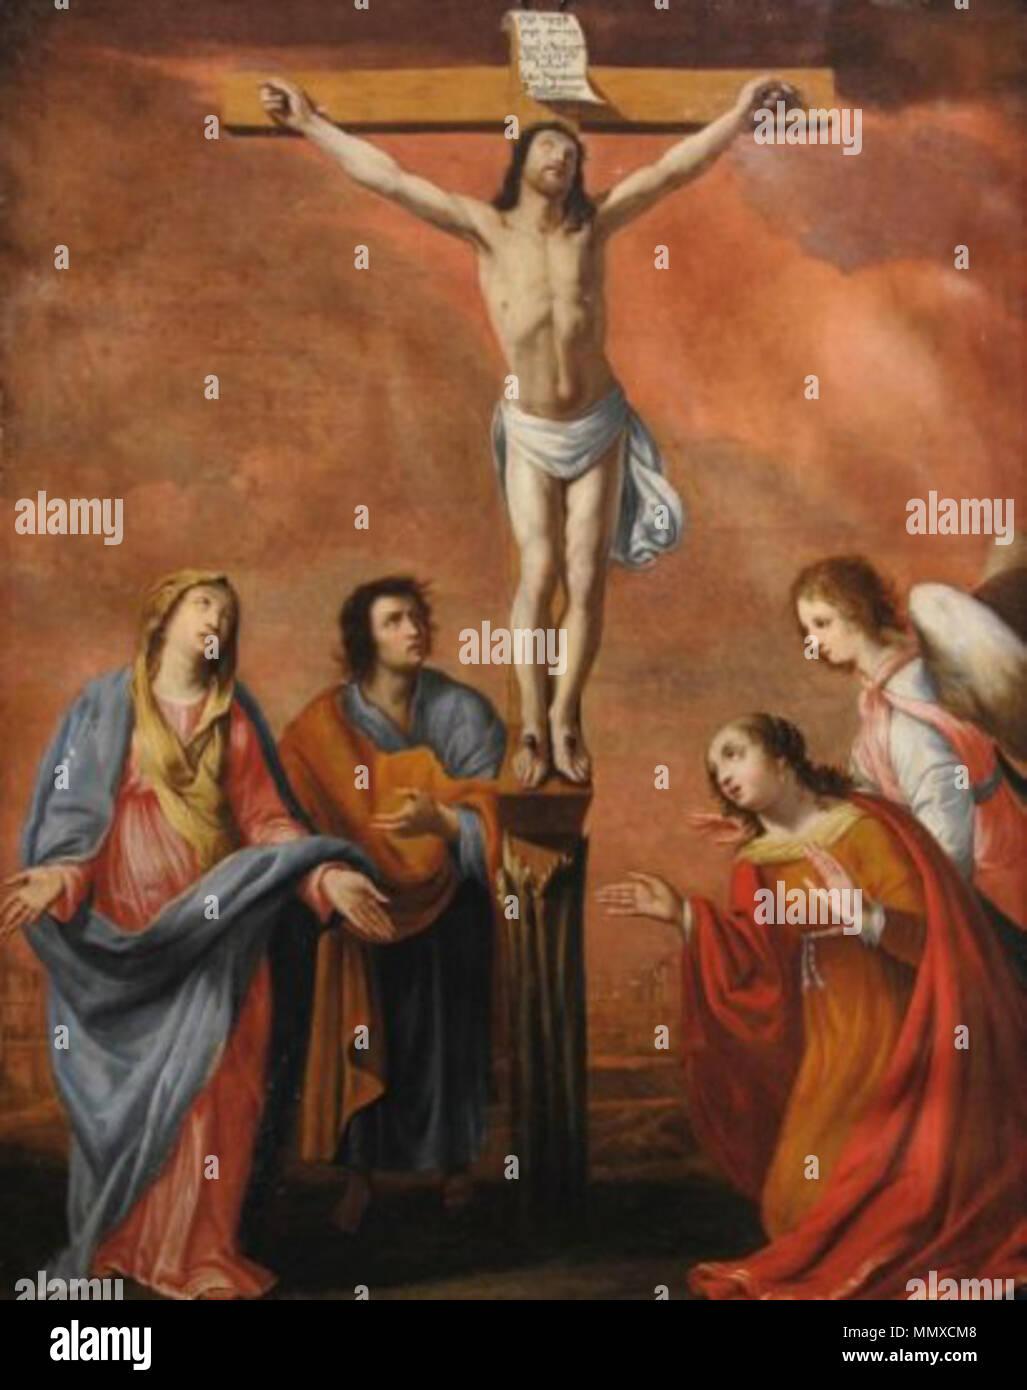 saint marys univers study - HD1027×1390